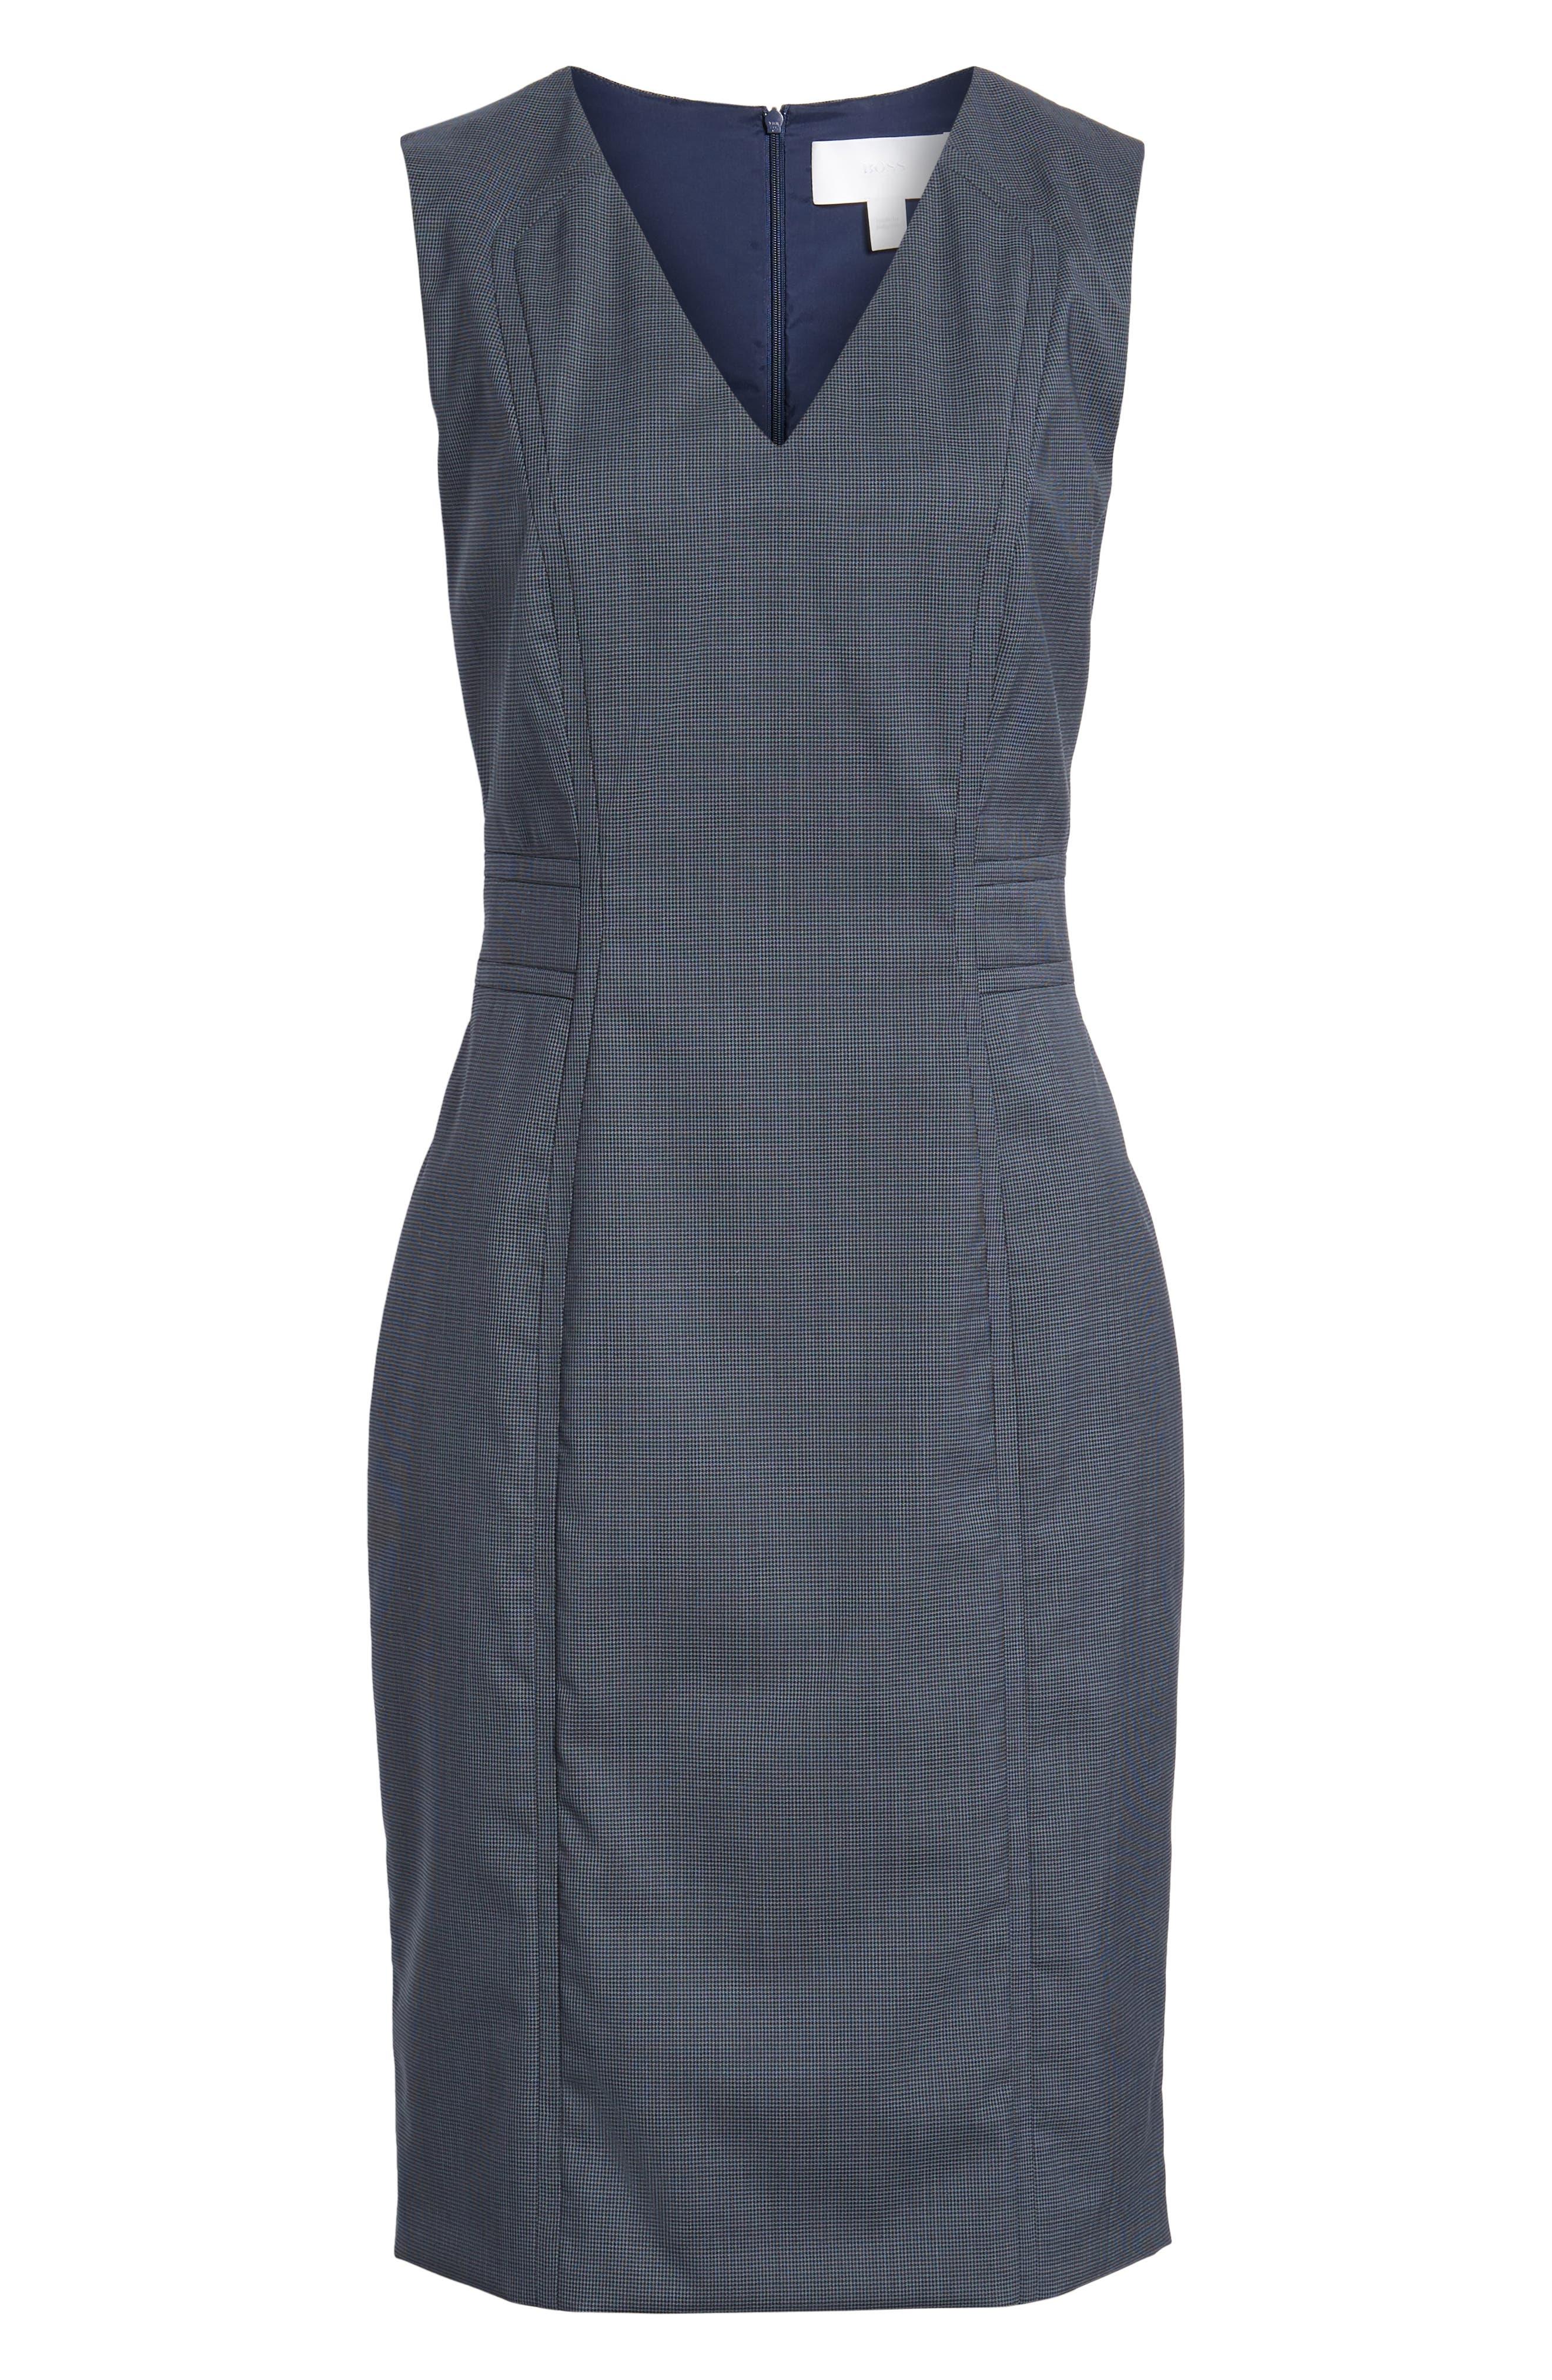 Dalouise Pepita Stretch Wool Sheath Dress,                             Alternate thumbnail 6, color,                             Nautic Blue Fantasy